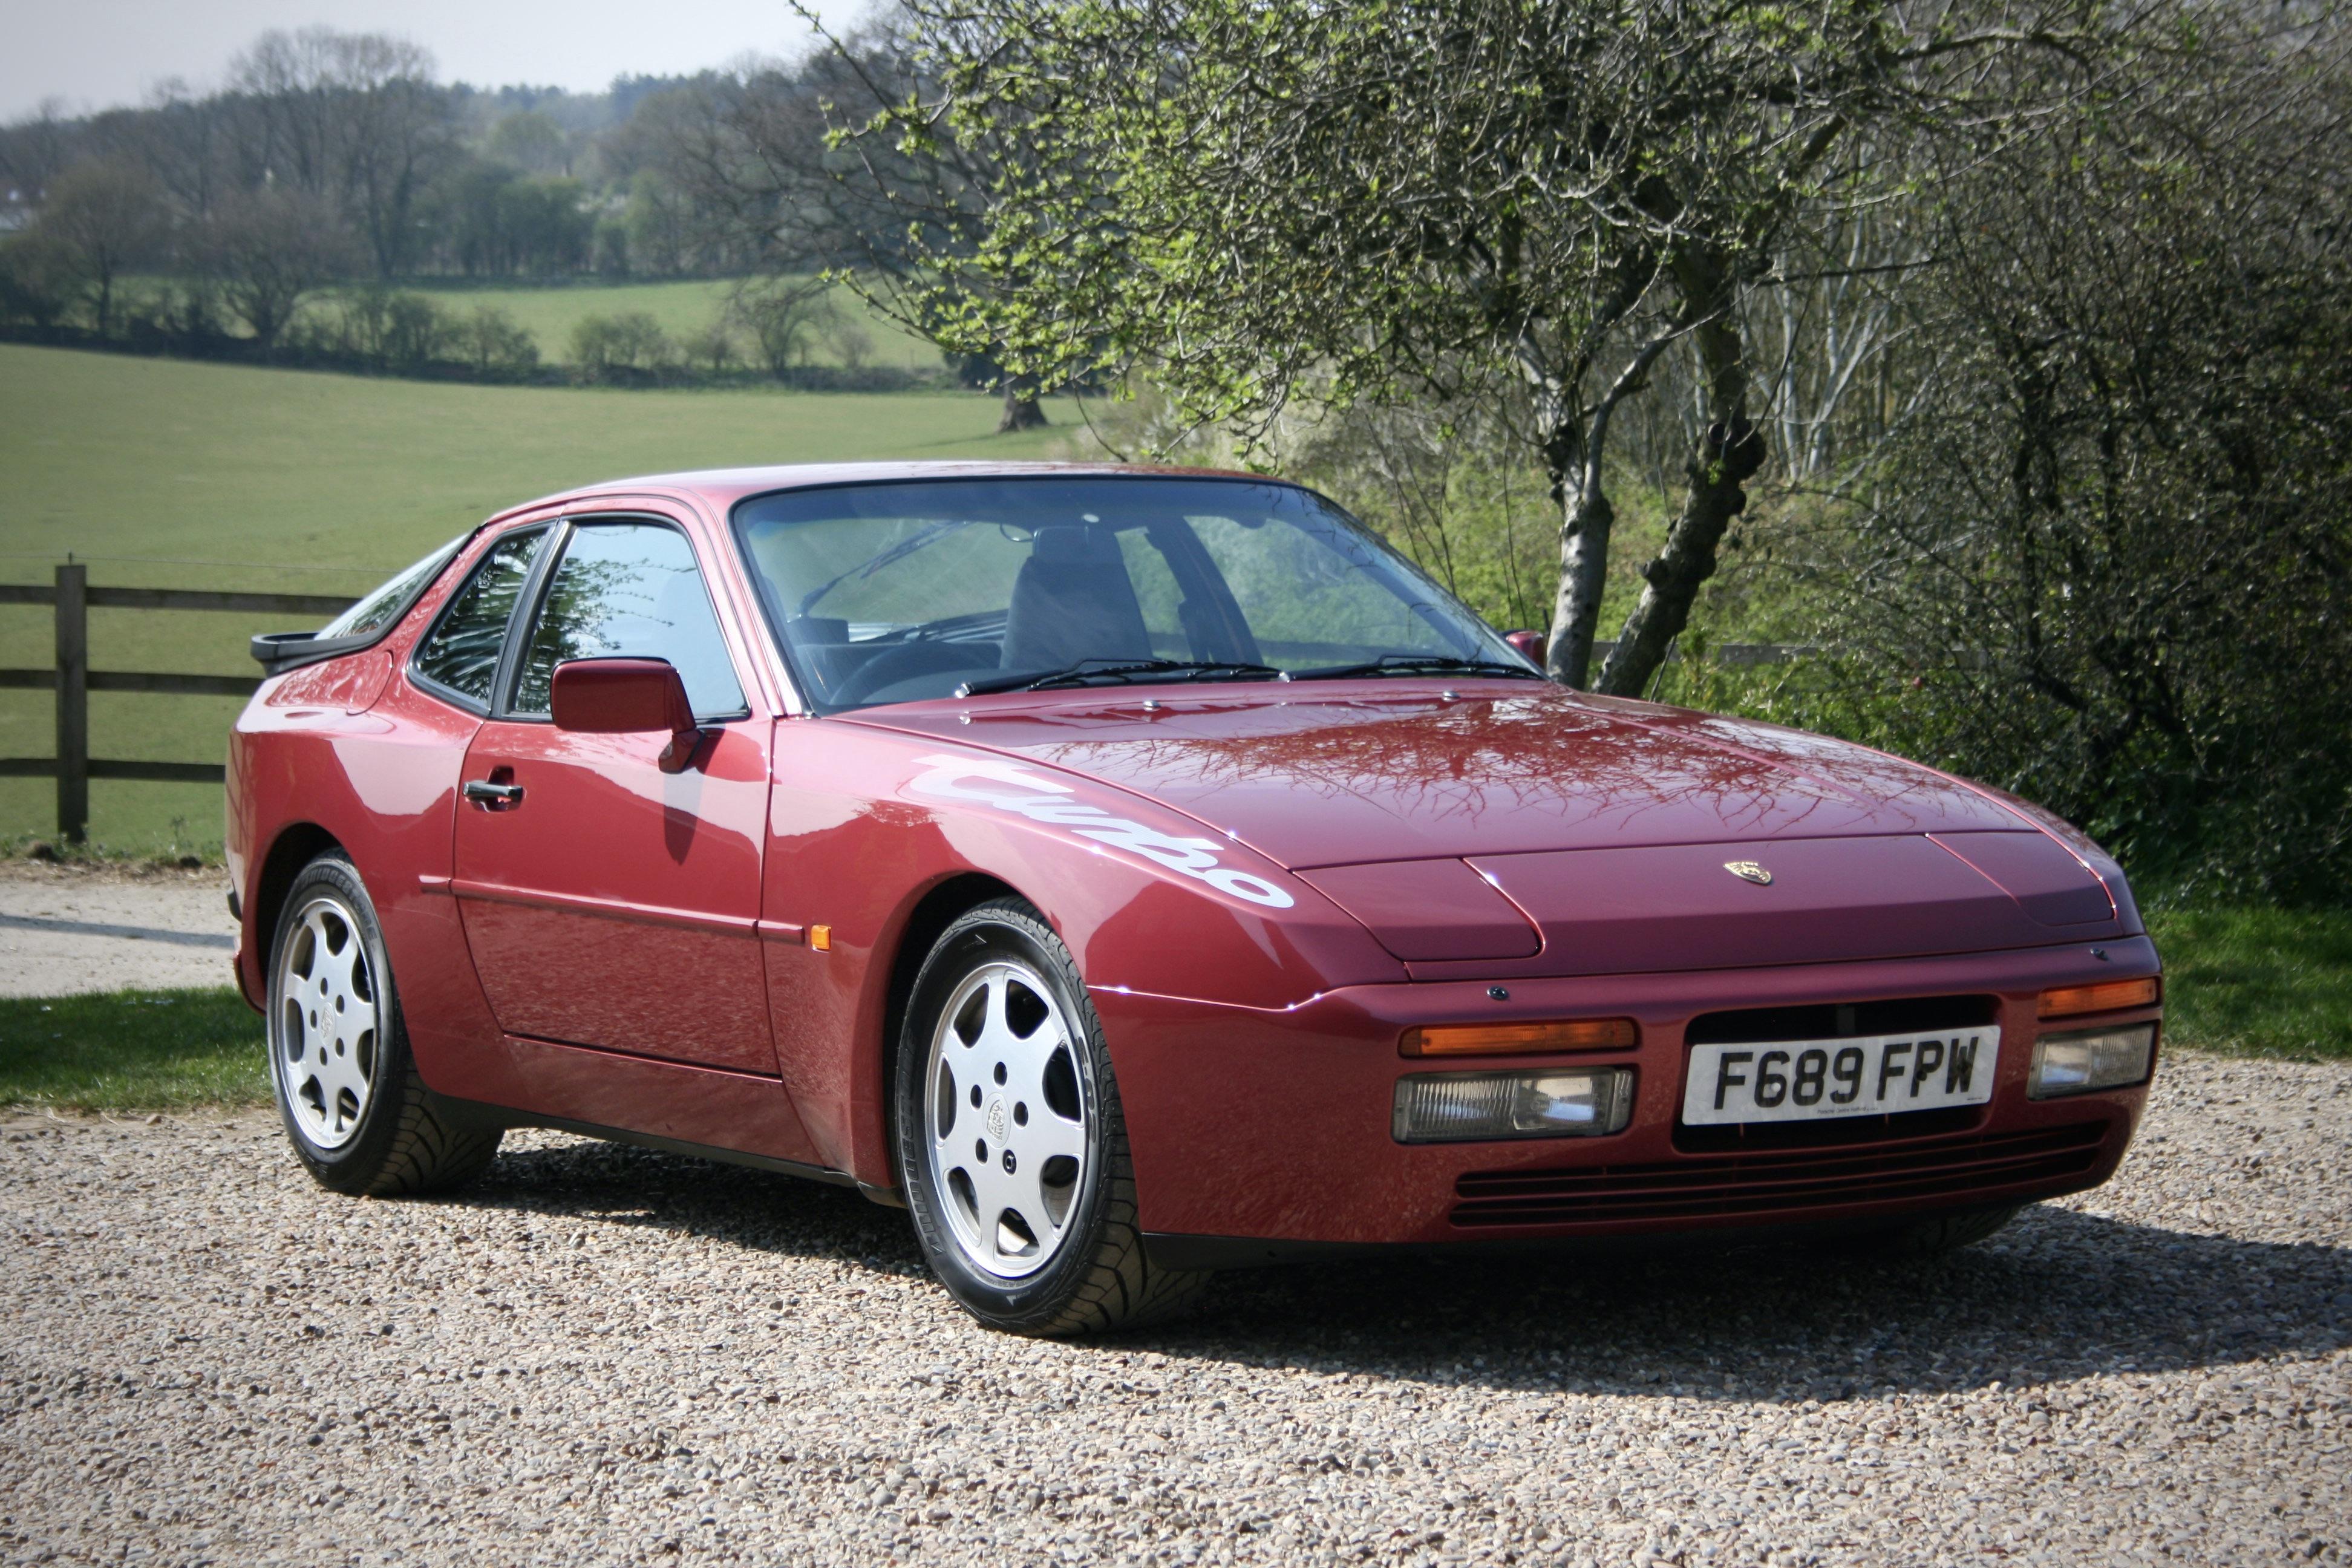 1989 Porsche 944 Turbo M030 7 500 Miles